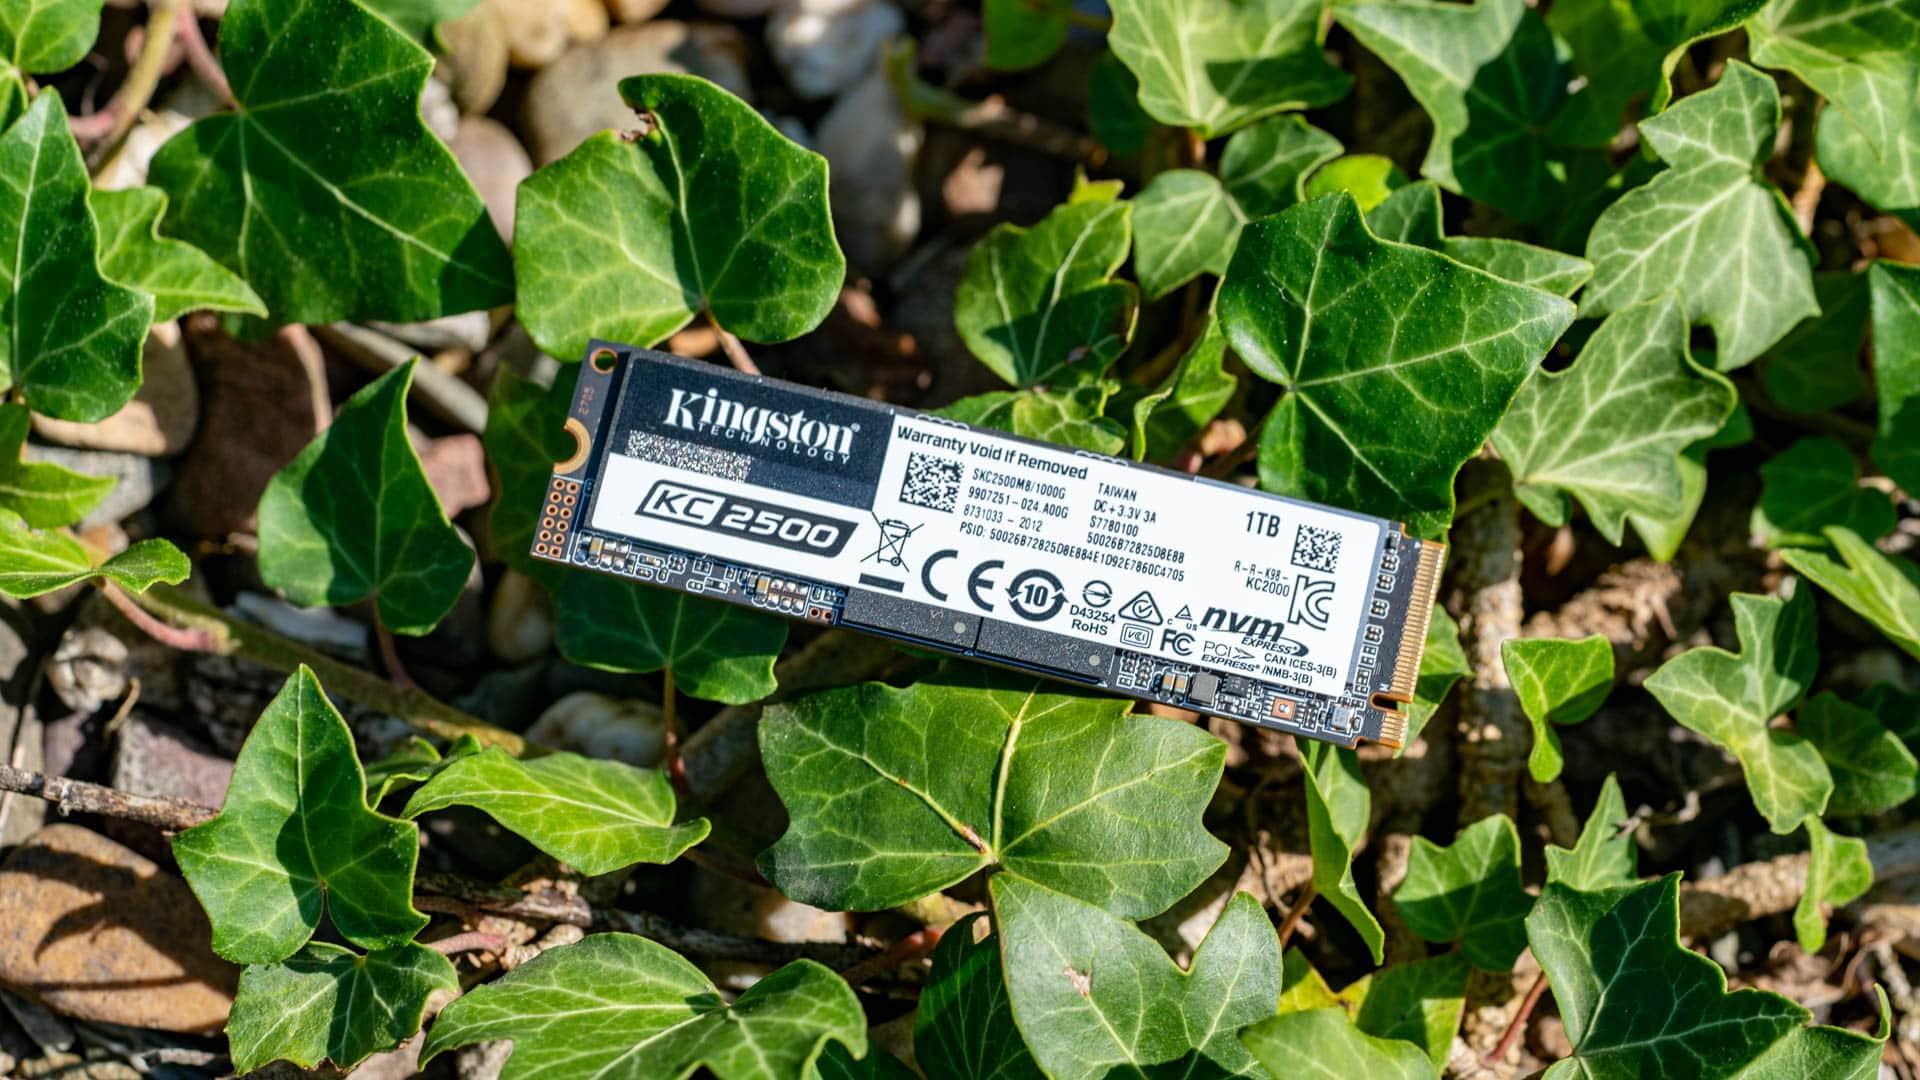 Die Kingston KC2500 SSD im Test